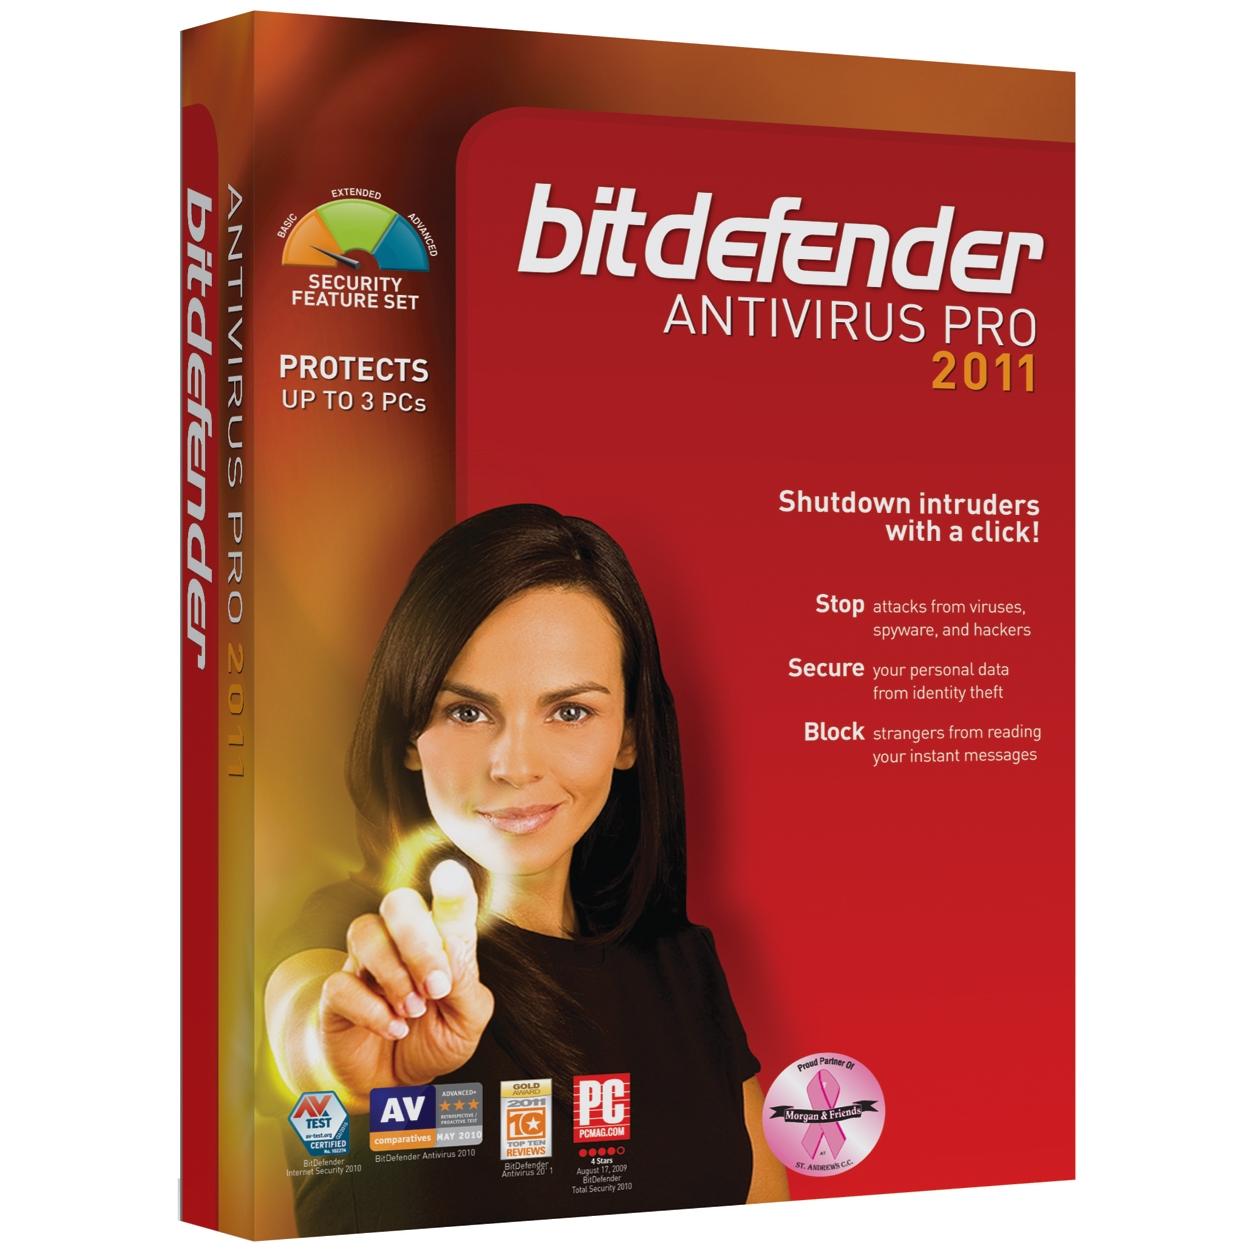 Download Bitdefender ANTIVIRUS PRO 2011 with Free Licensi | Fresh Master Software